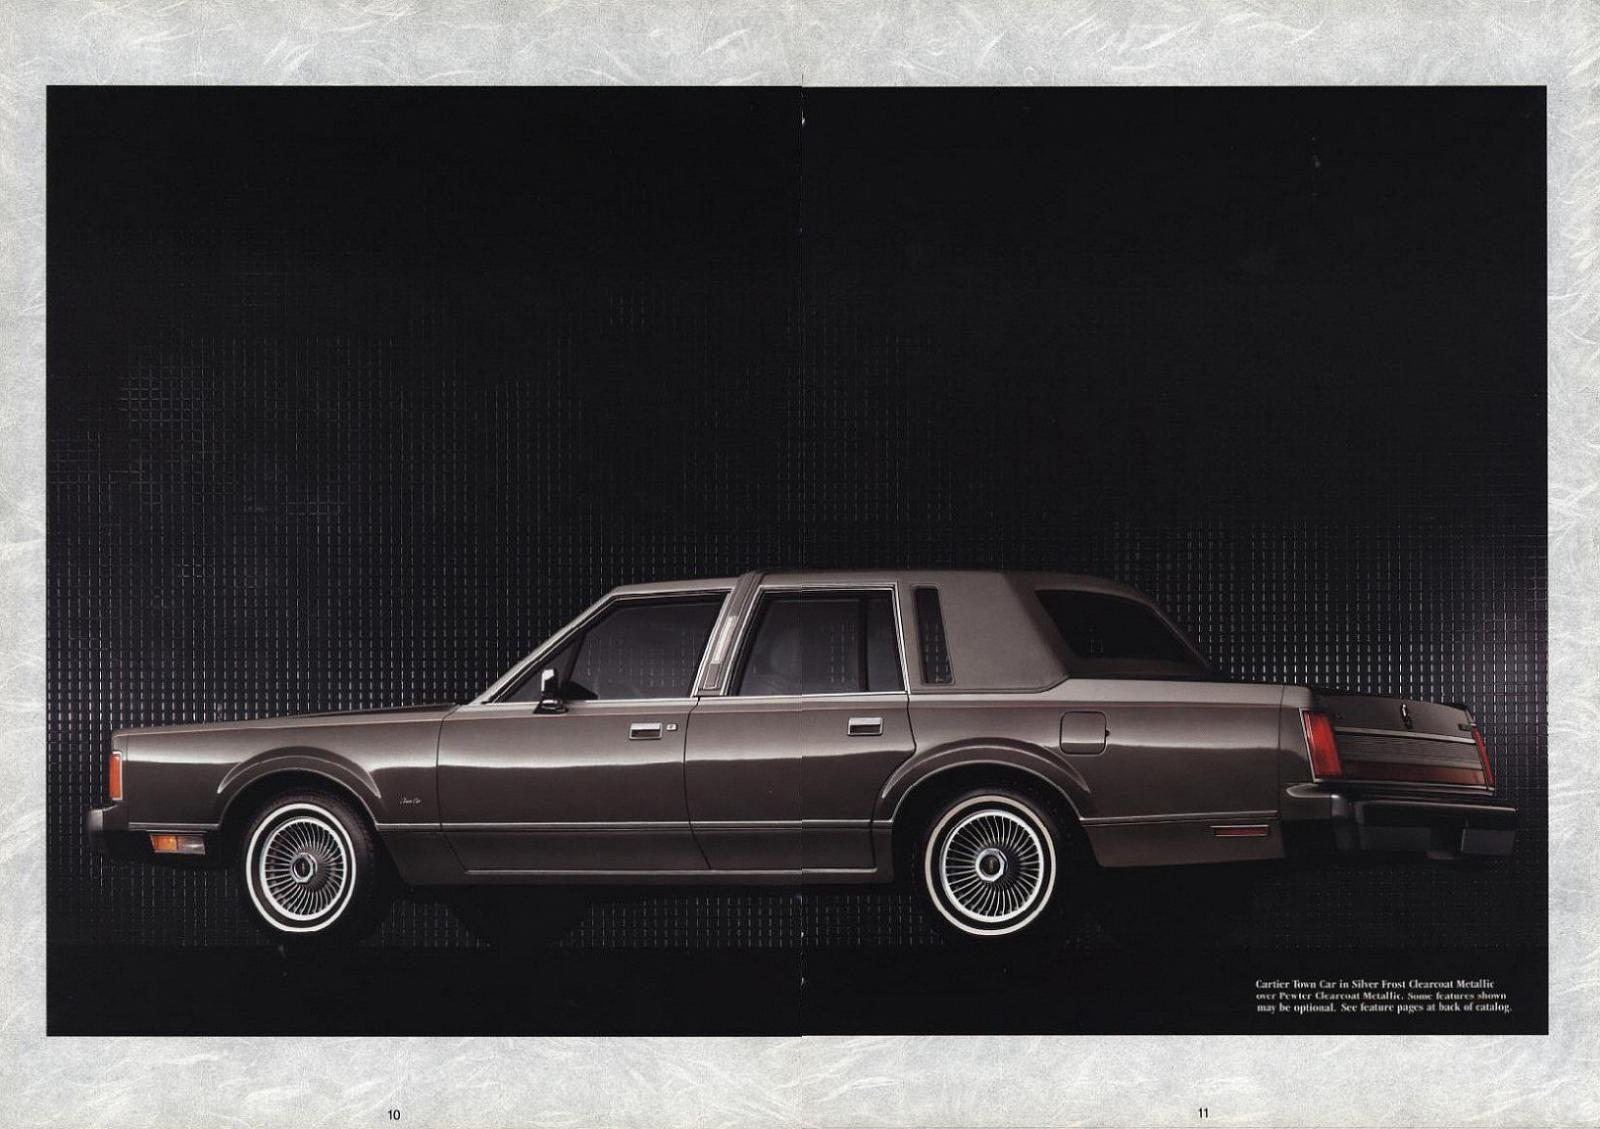 1989 lincoln continental town car models lineup [ 1600 x 1129 Pixel ]